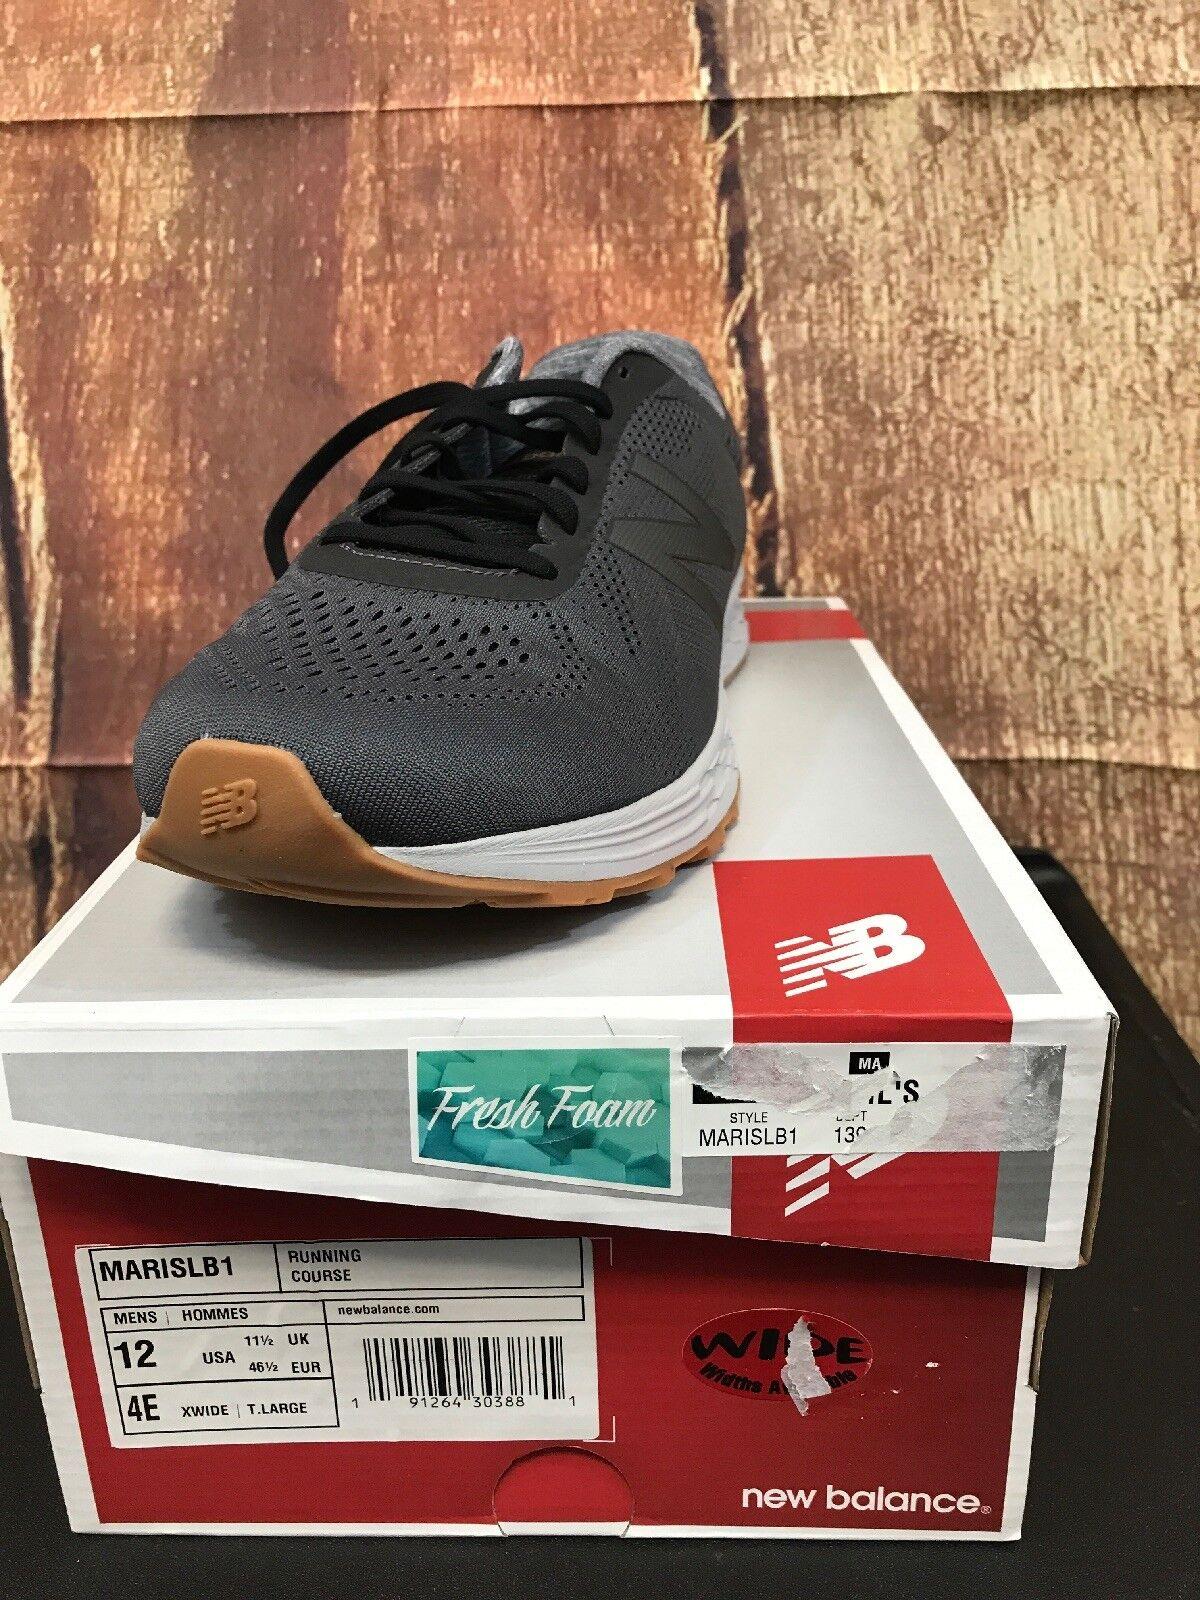 promo code 9ed91 a4058 New Balance Balance Balance Fresh Foam Arishi Men s Running Shoes DK GRAY  SZ 12 4E a903cd